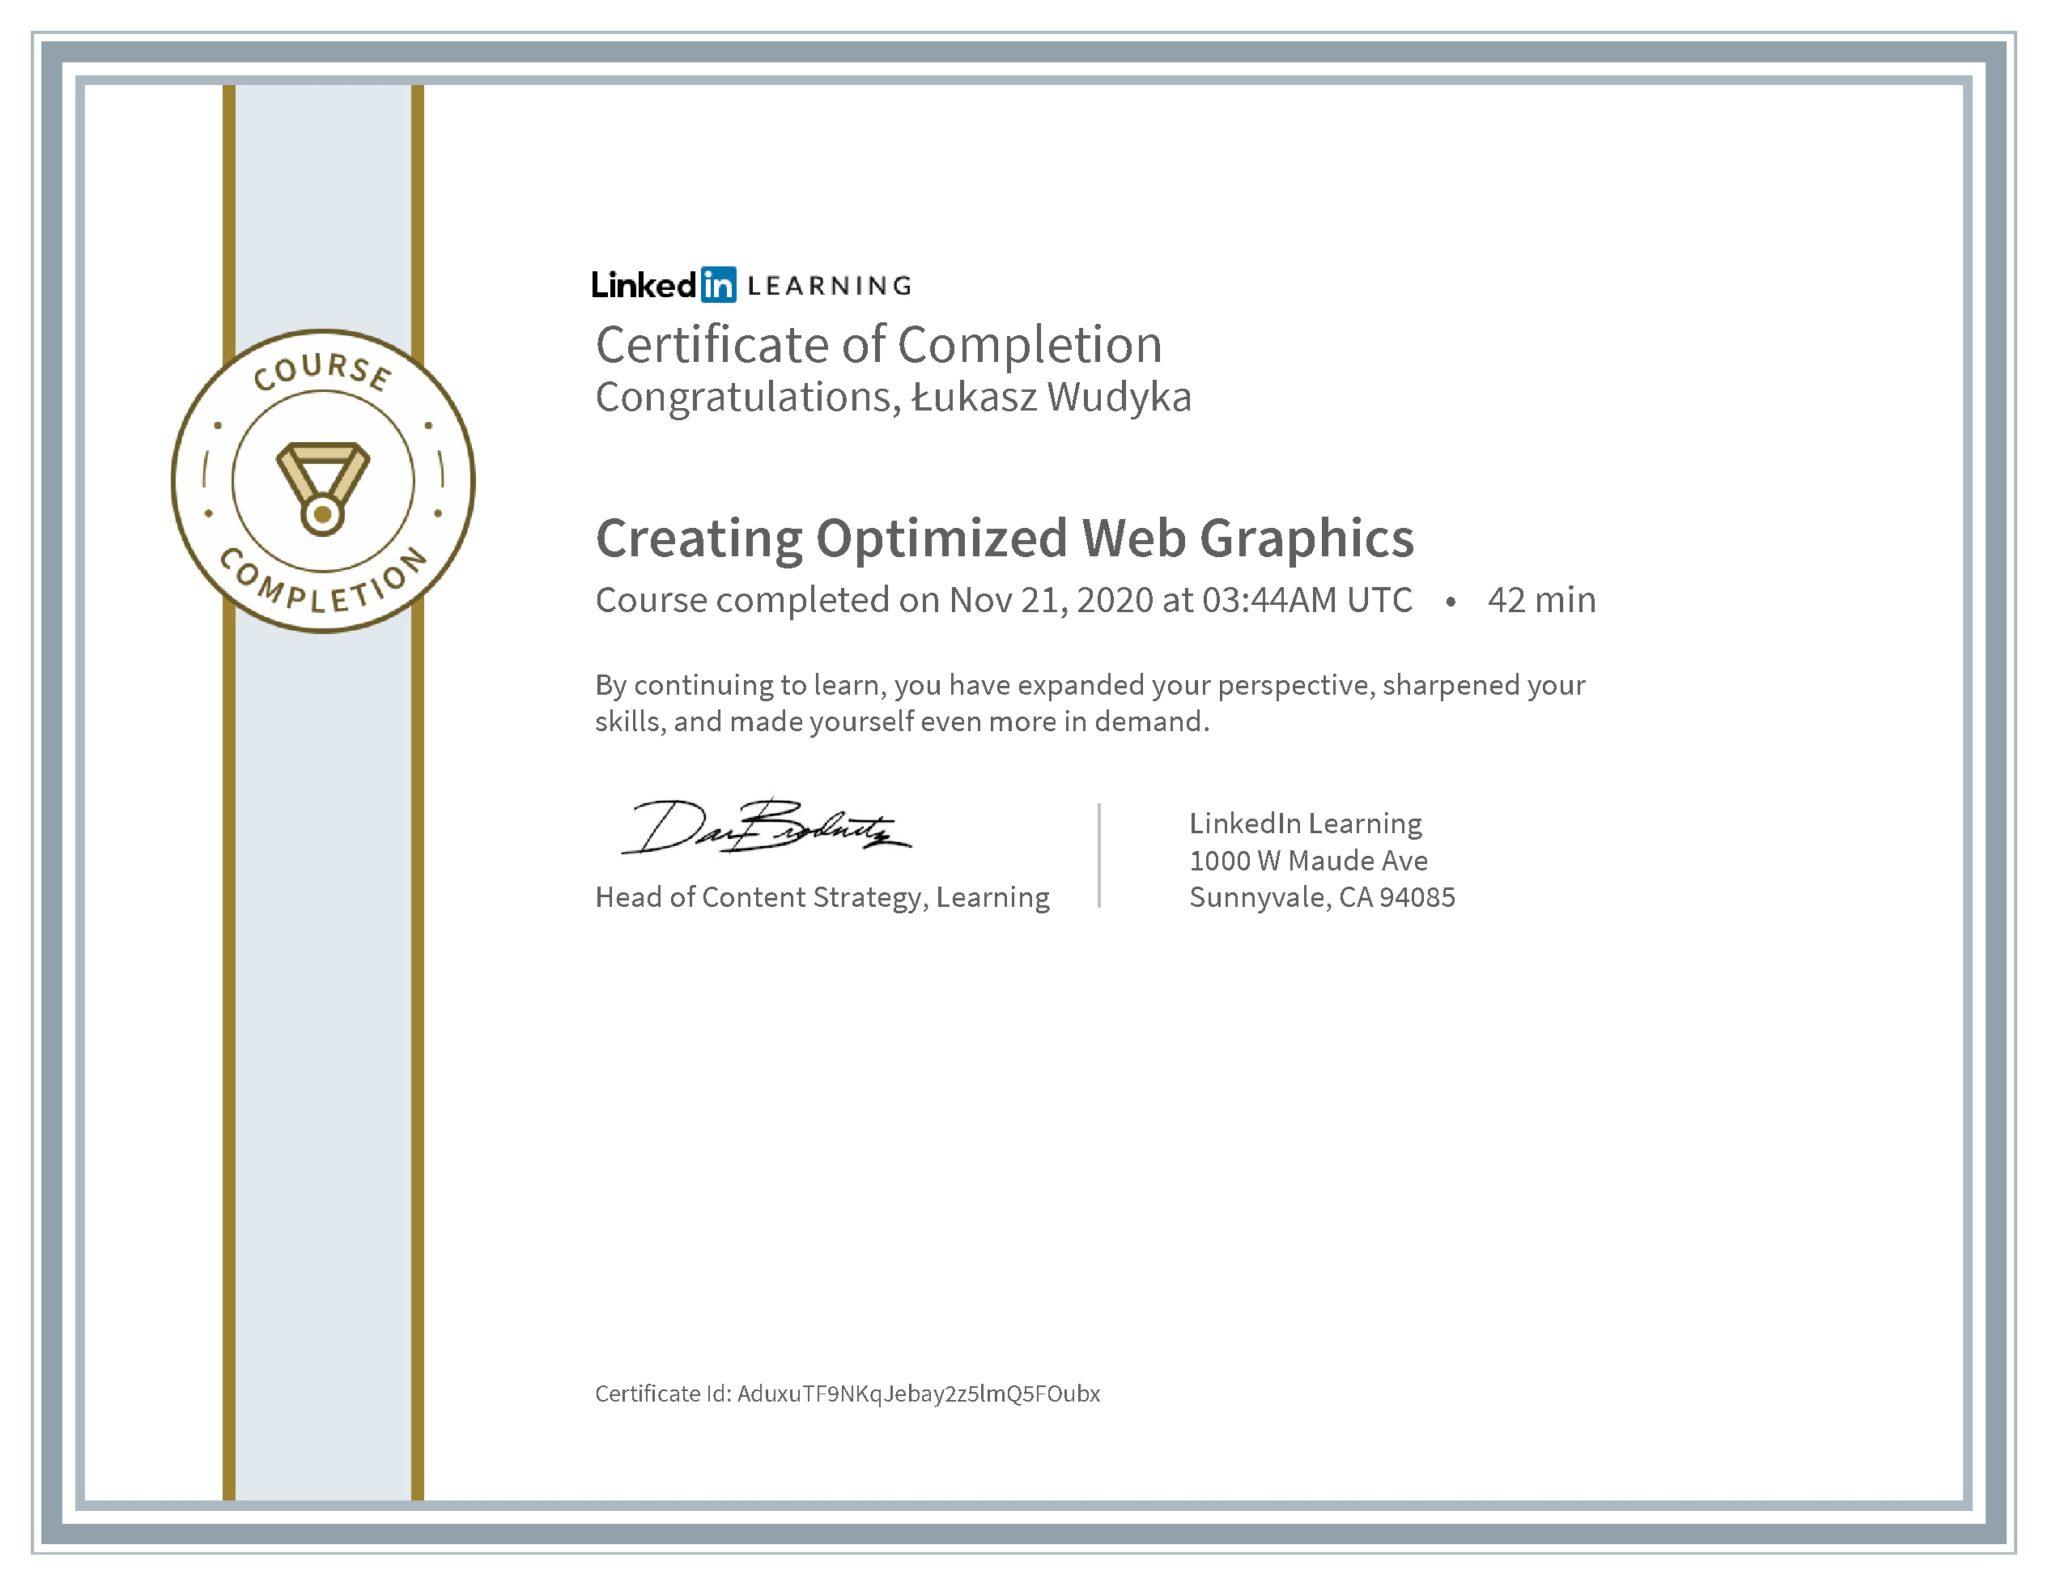 Łukasz Wudyka certyfikat LinkedIn Creating Optimized Web Graphics